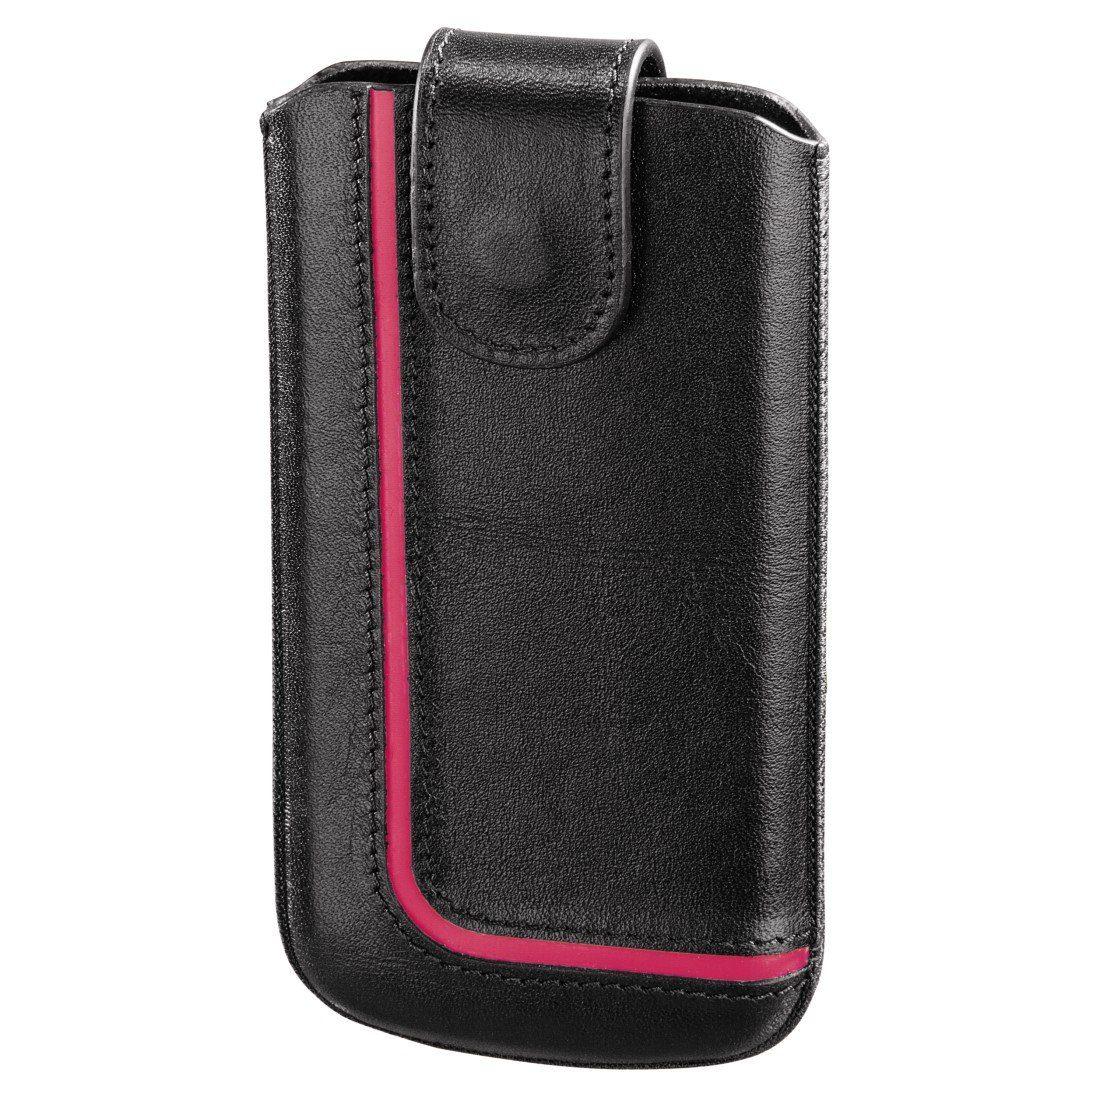 Hama Handy-Sleeve Neon Black, Gr. L, Schwarz/Pink